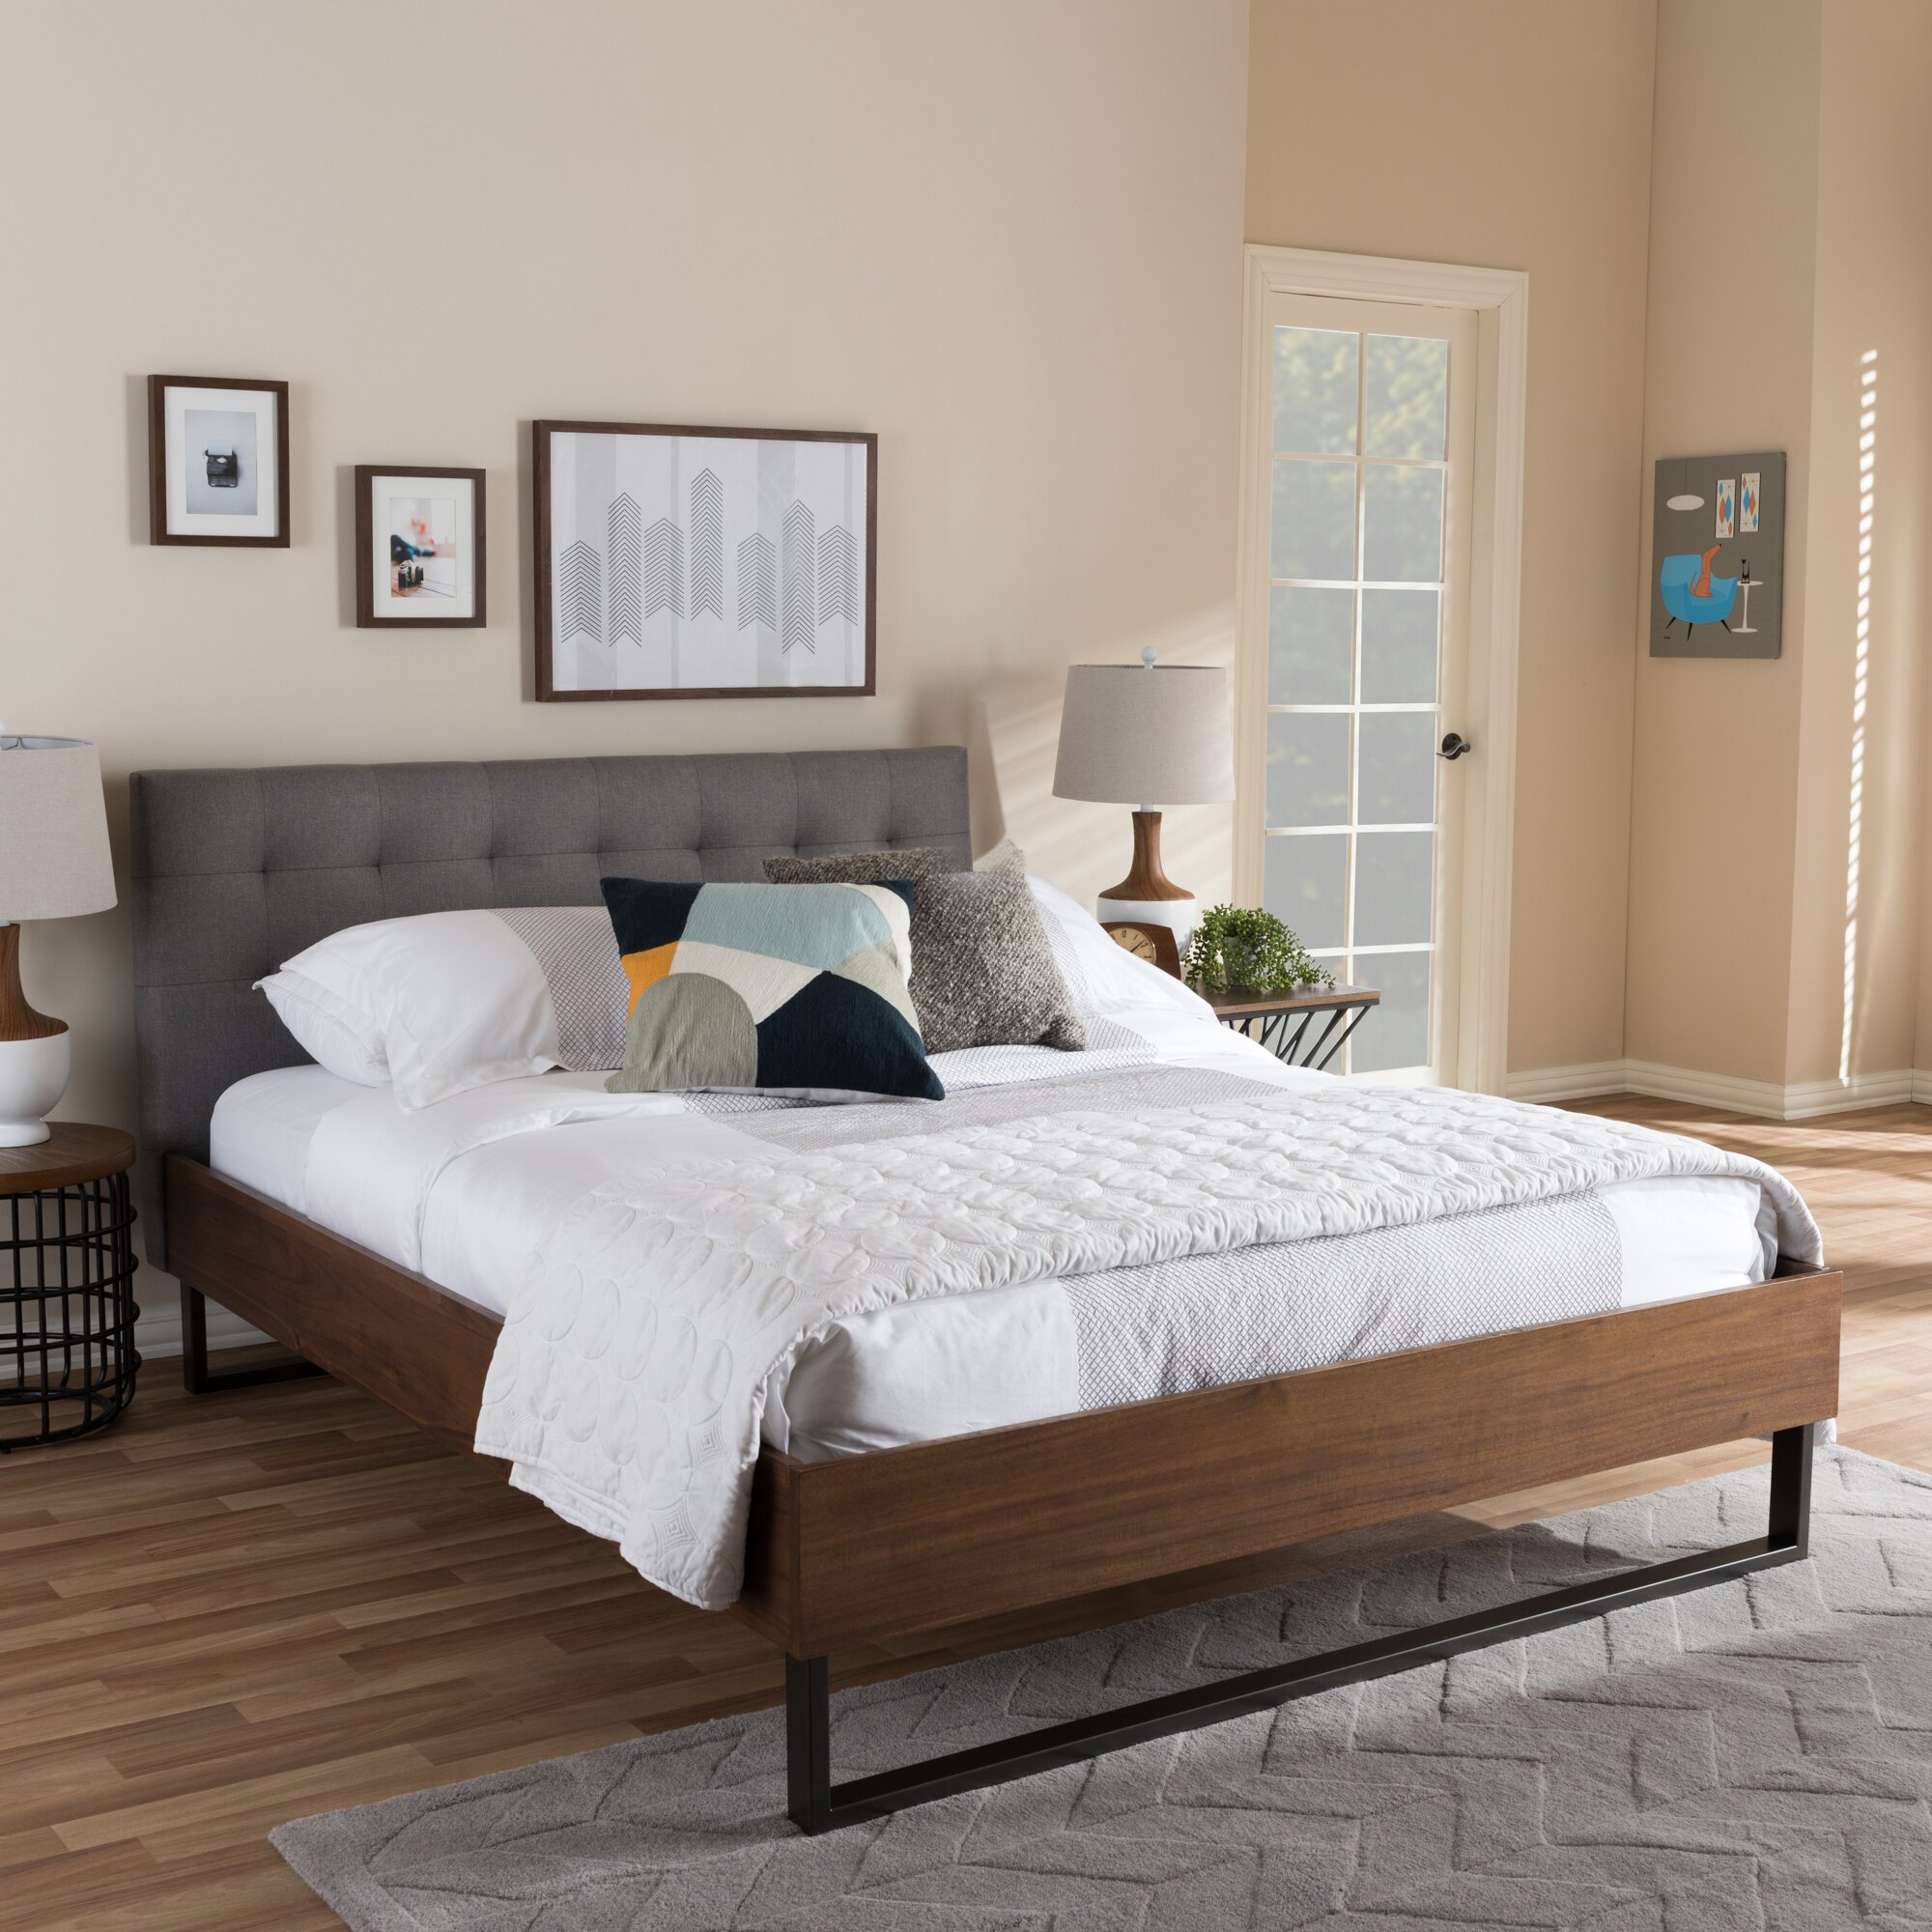 wholesale interiors baxton studio alberto upholstered platform bed  - baxton studio alberto upholstered platform bed